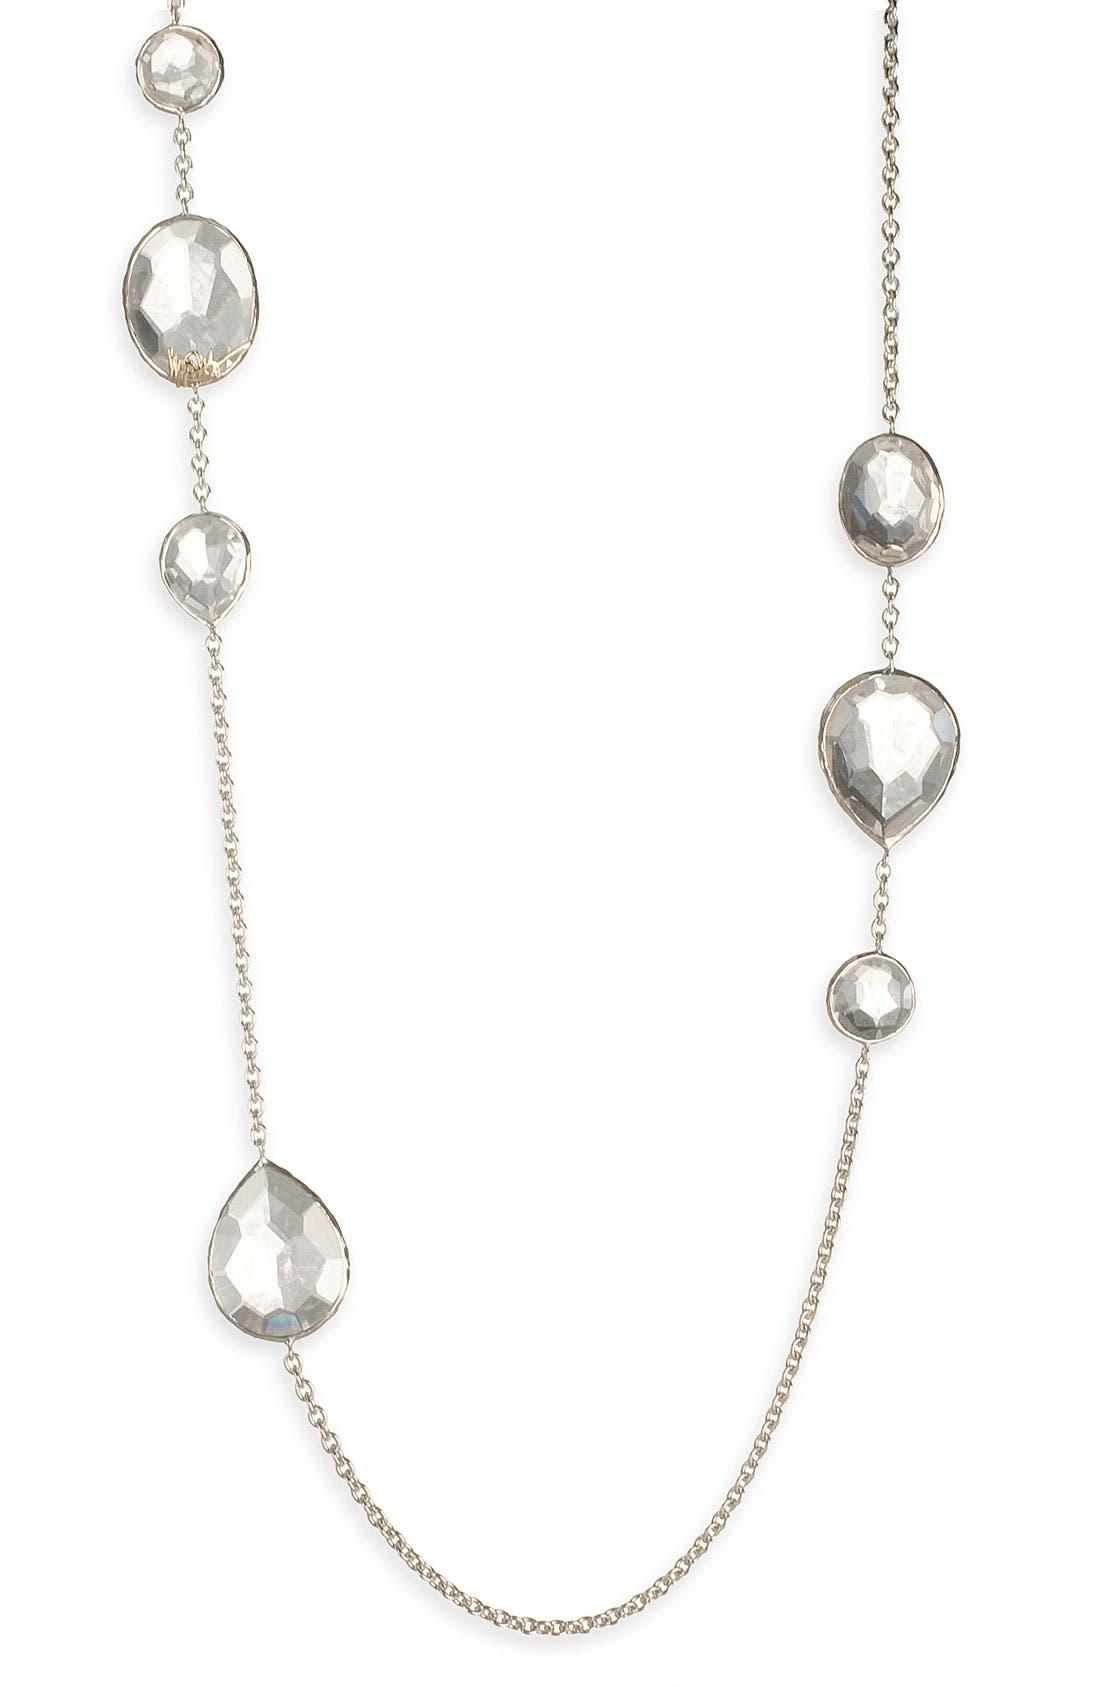 Main Image - Ippolita 'Rock Candy - Gelato' Station Long Necklace